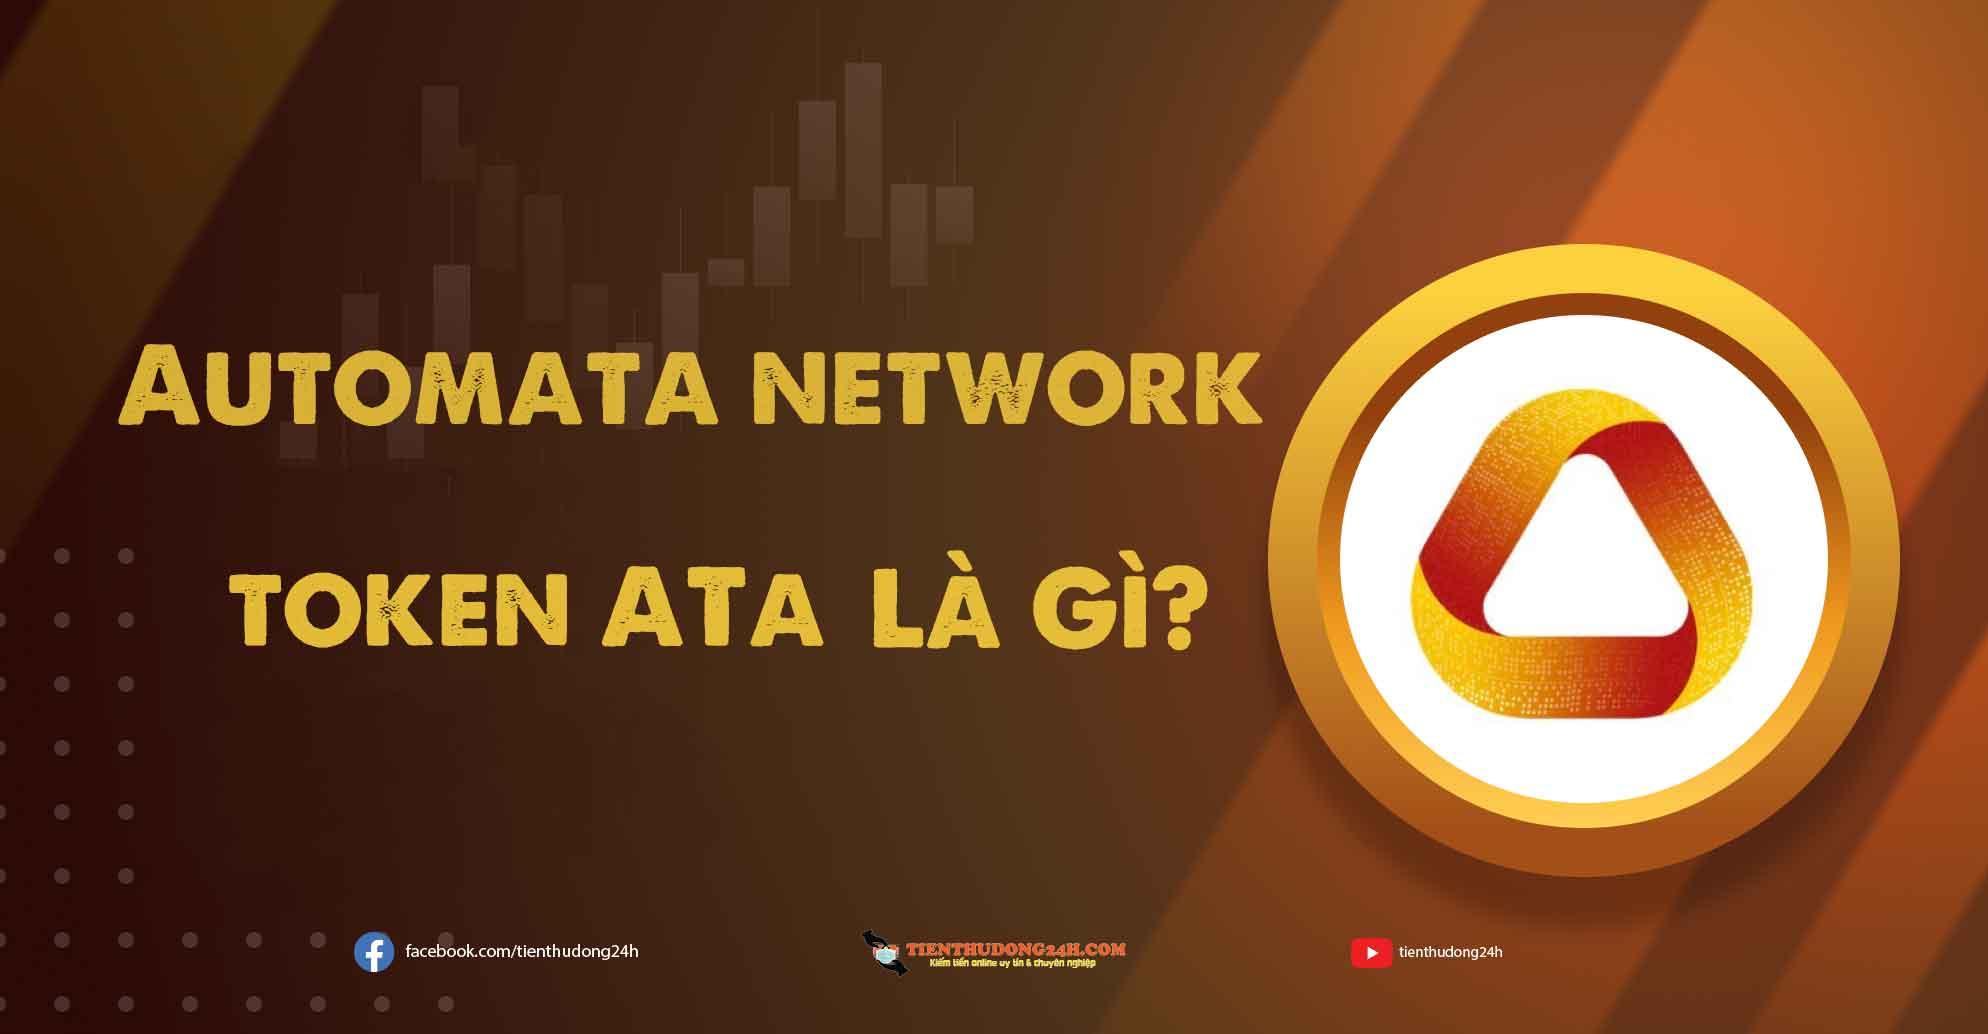 Automata network (ATA) là gì?